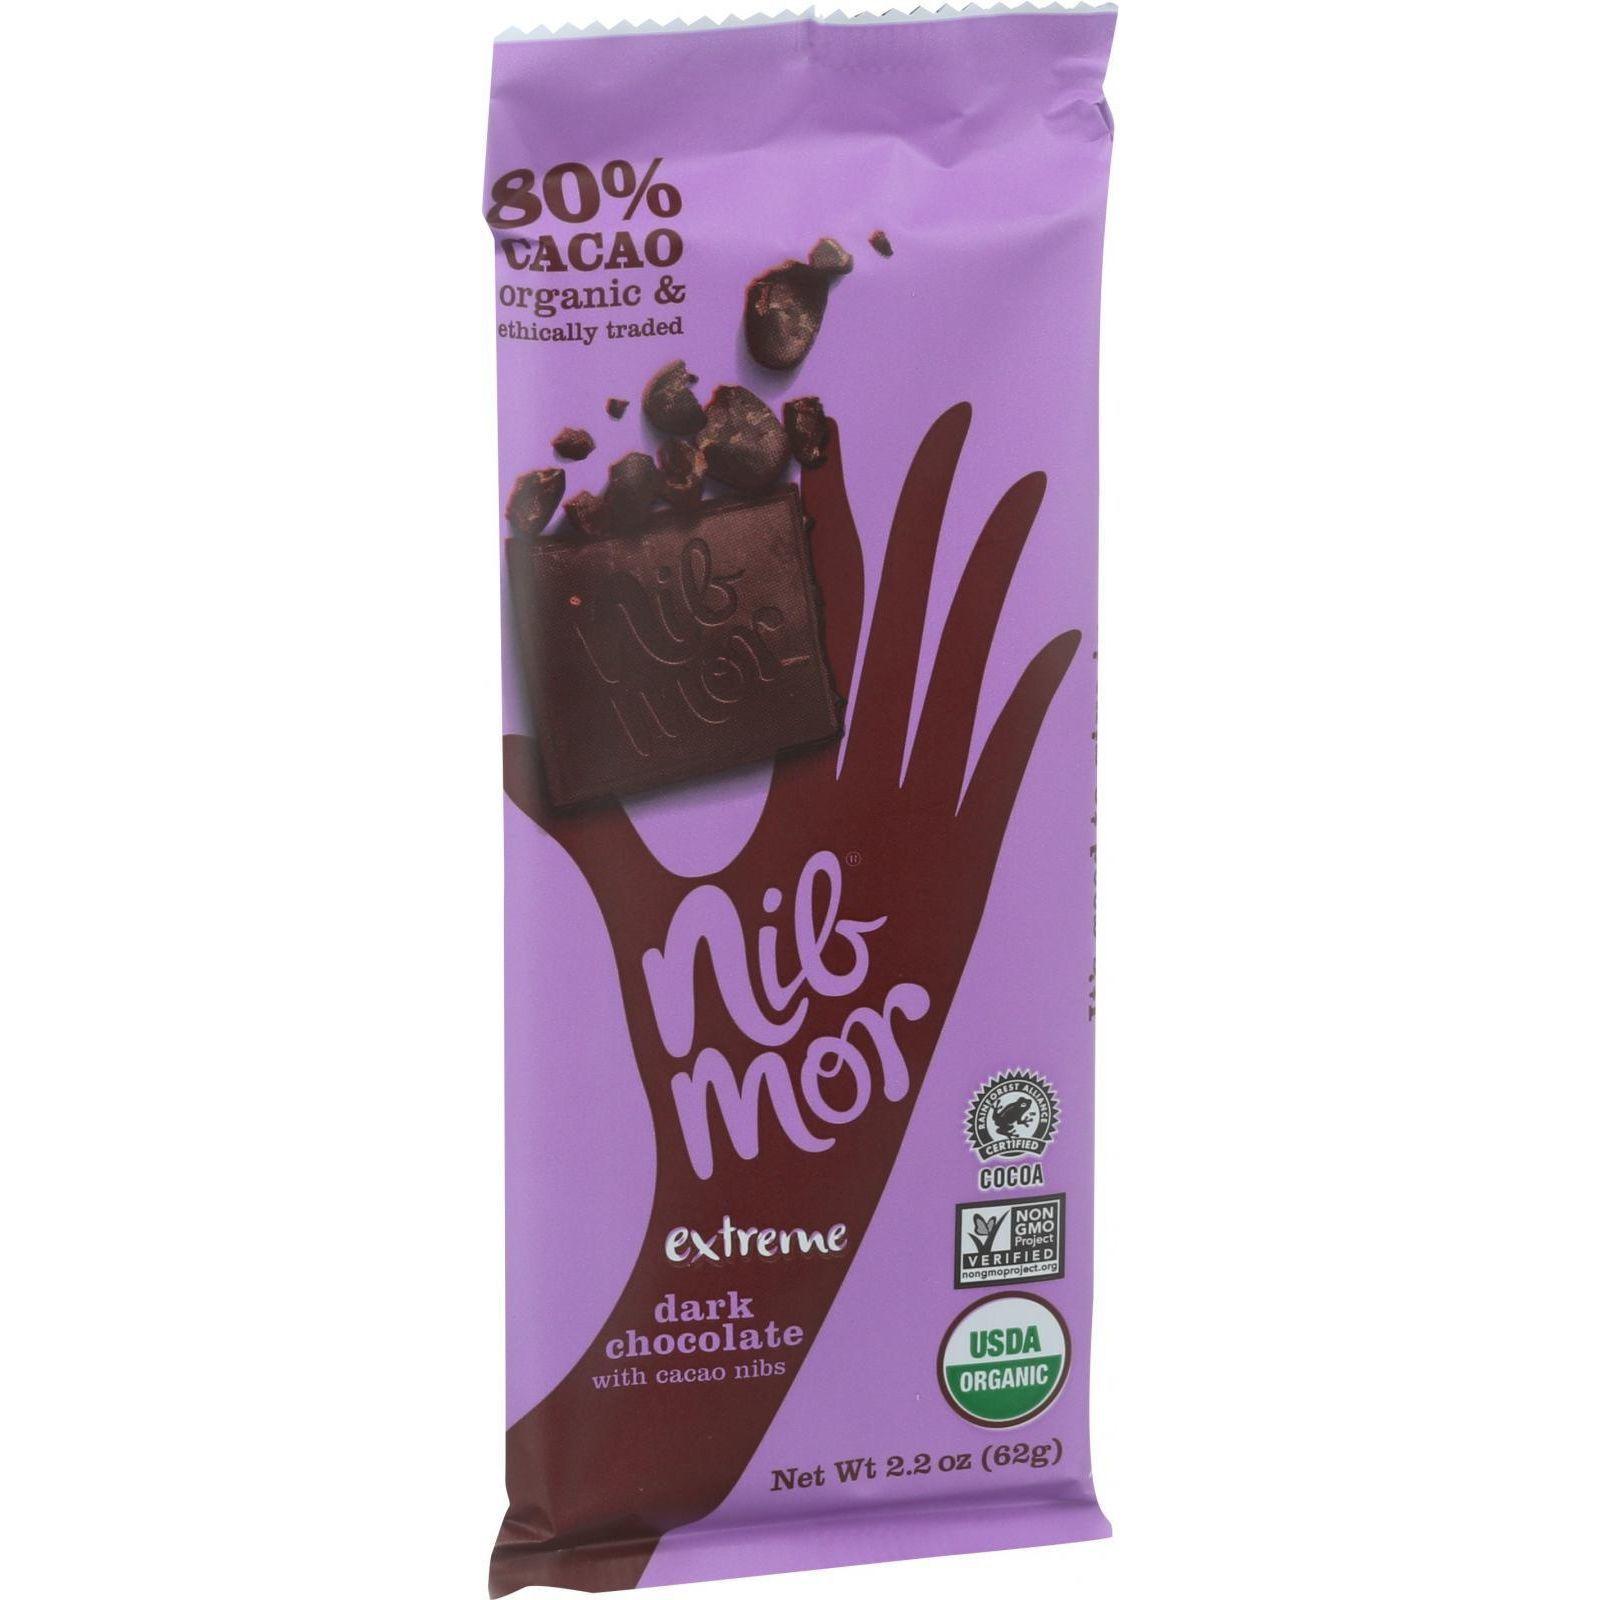 NibMor Organic Dark Chocolate Bars - Extreme with Cocoa Nibs - 2.2 oz Bars - Case of 12